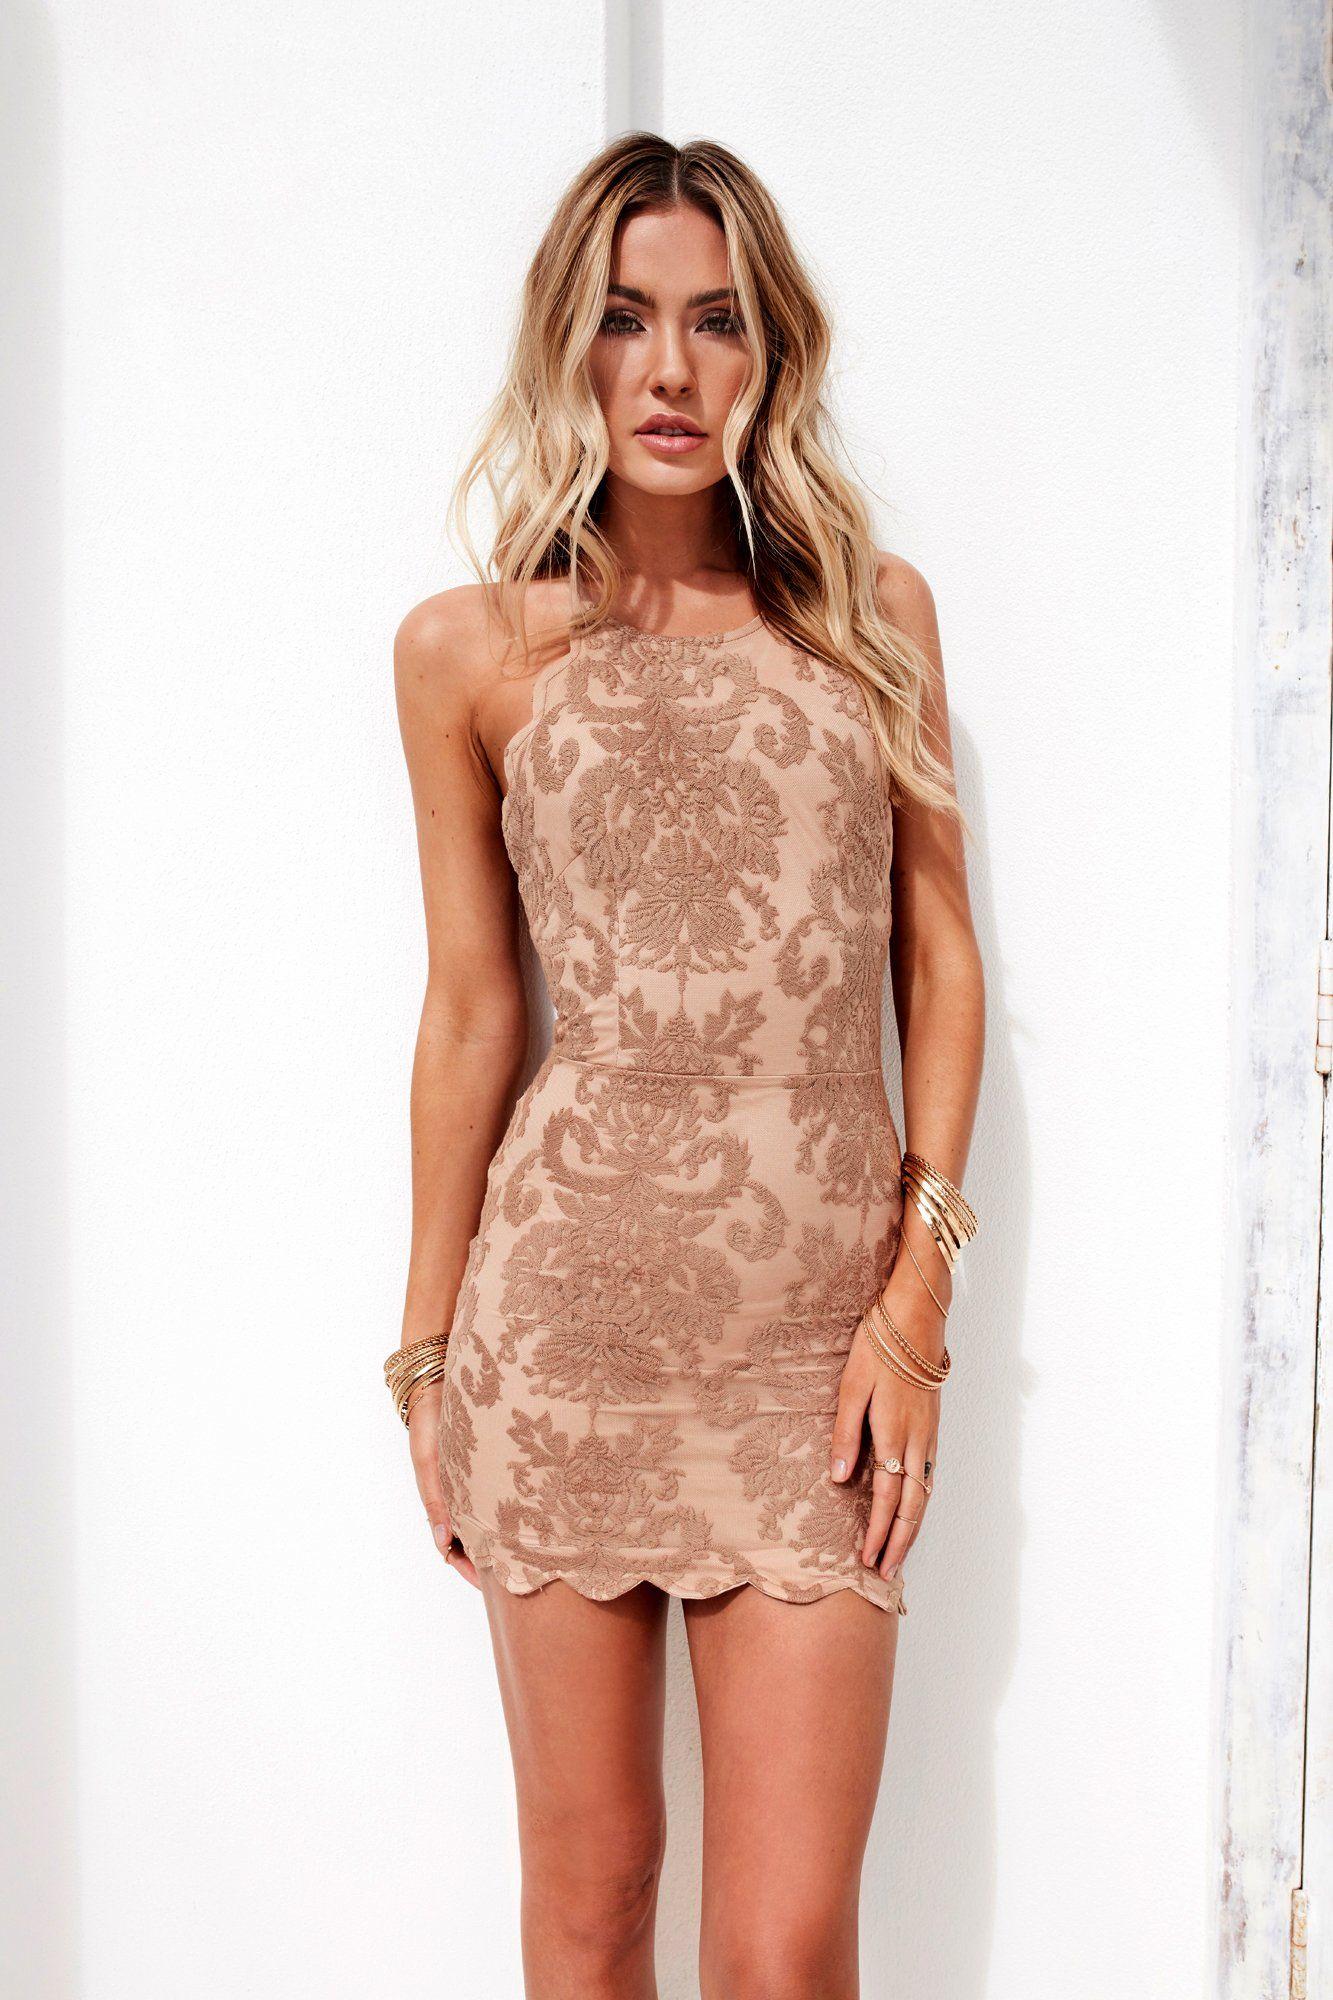 Inka Lace DressDelicate soft lace in mocha with beige underlaySelf